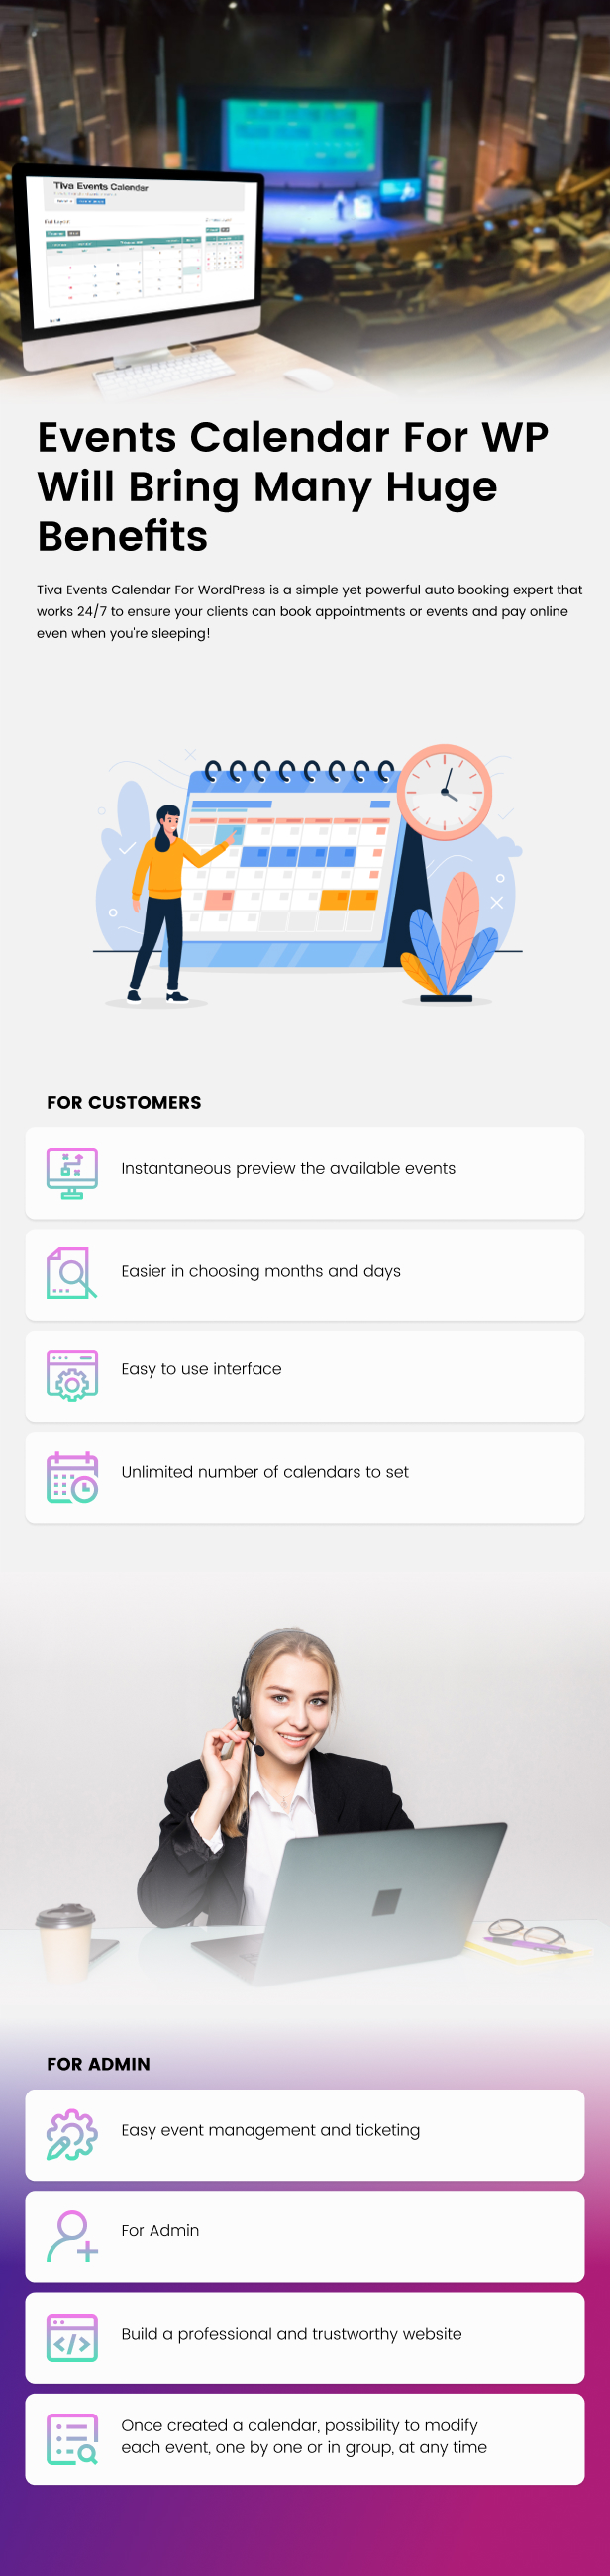 Tiva Events Calendar For WordPress - 6